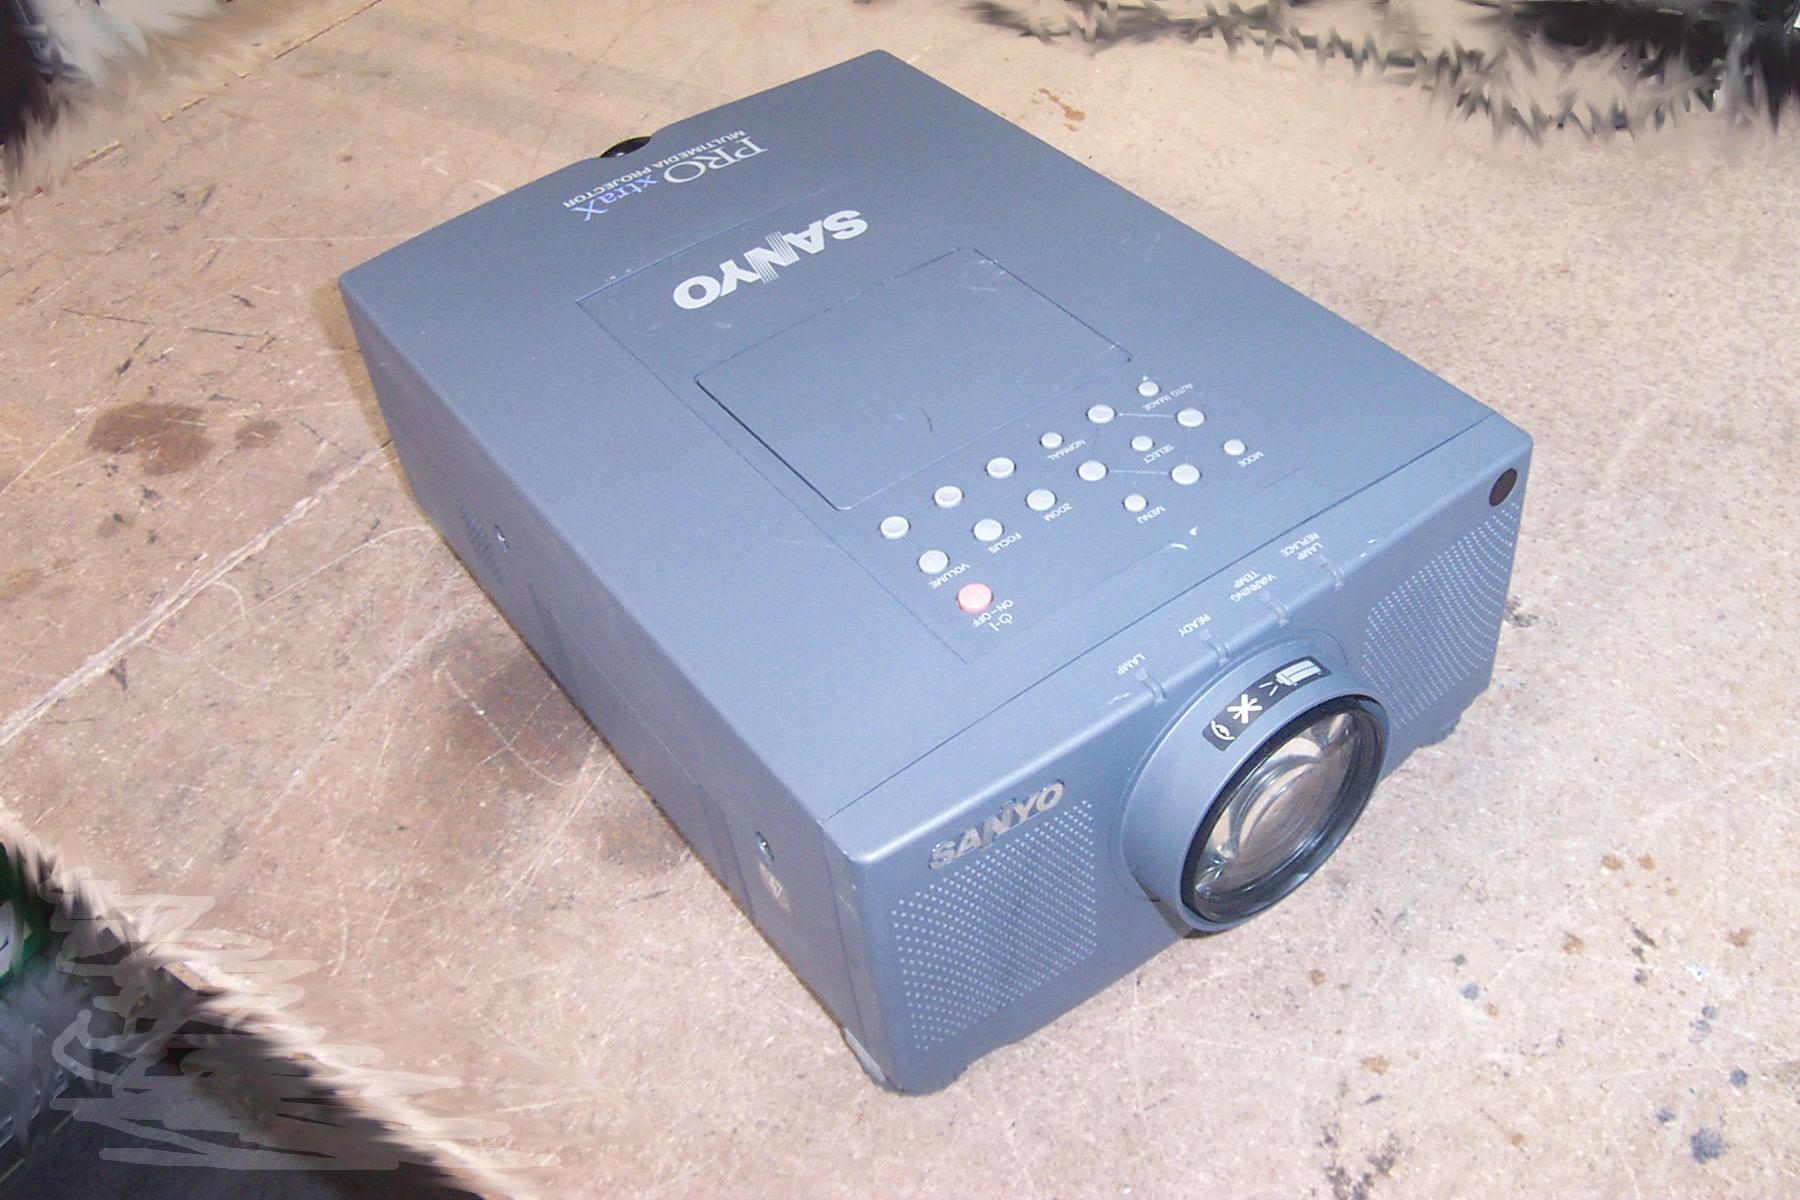 sanyo plc xp07b pro xtrax multimedia projector ebay. Black Bedroom Furniture Sets. Home Design Ideas